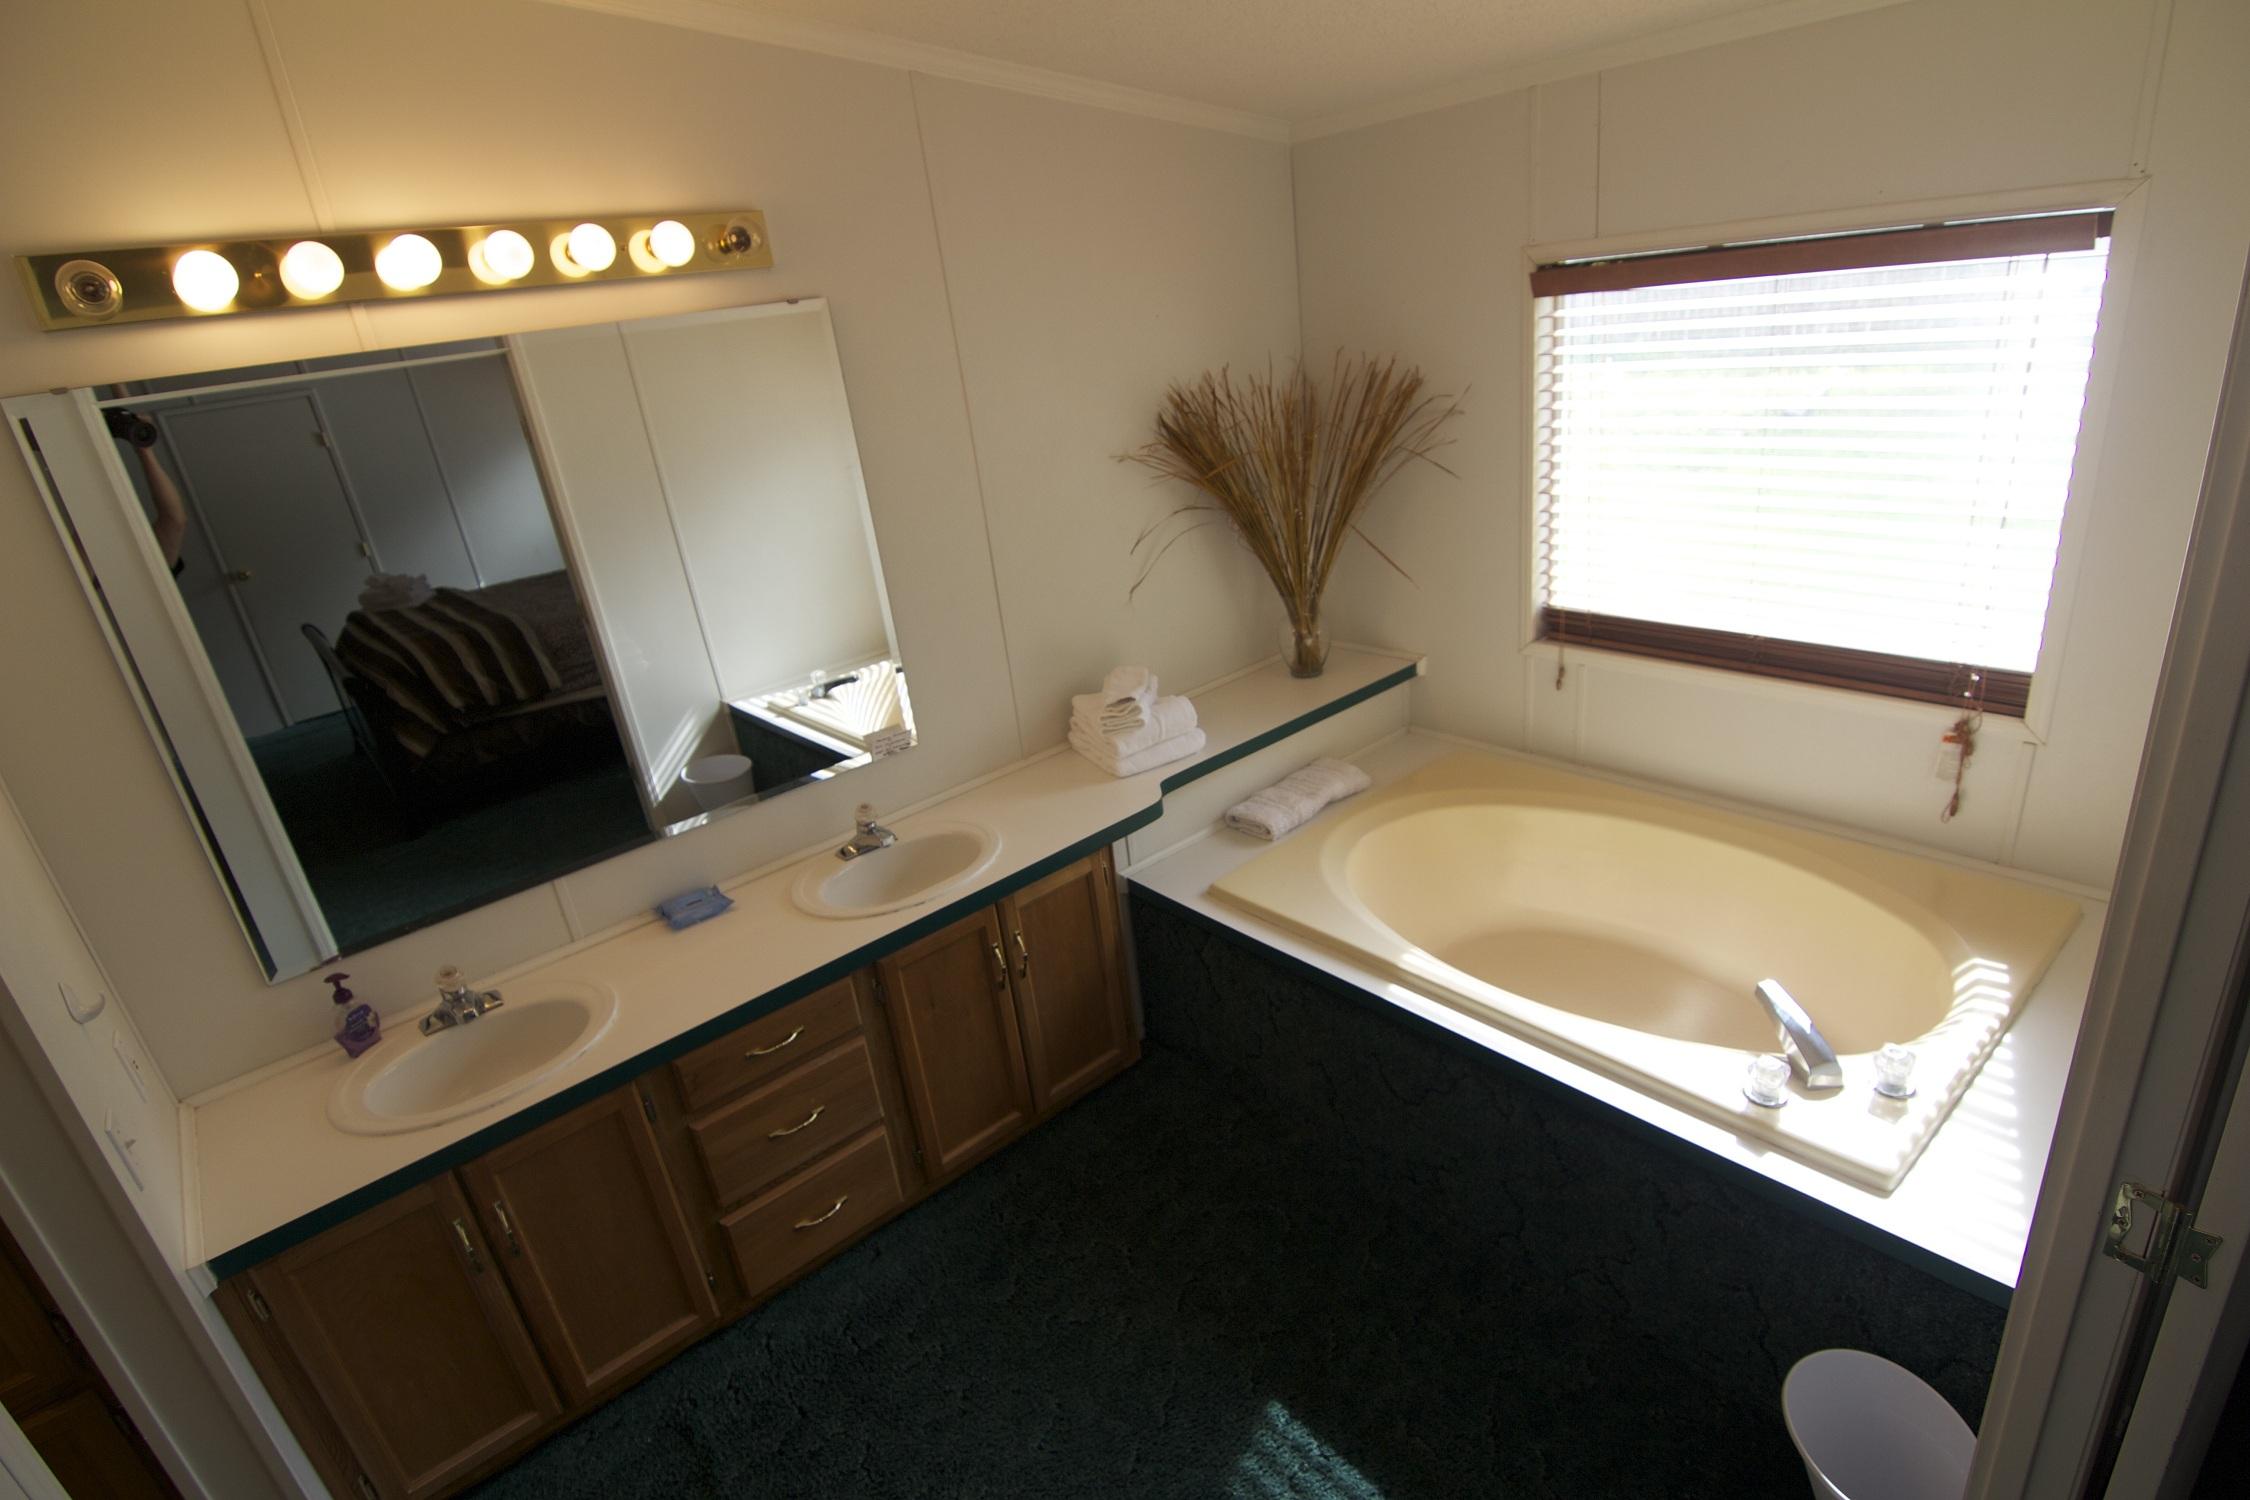 North 40 Bathroom